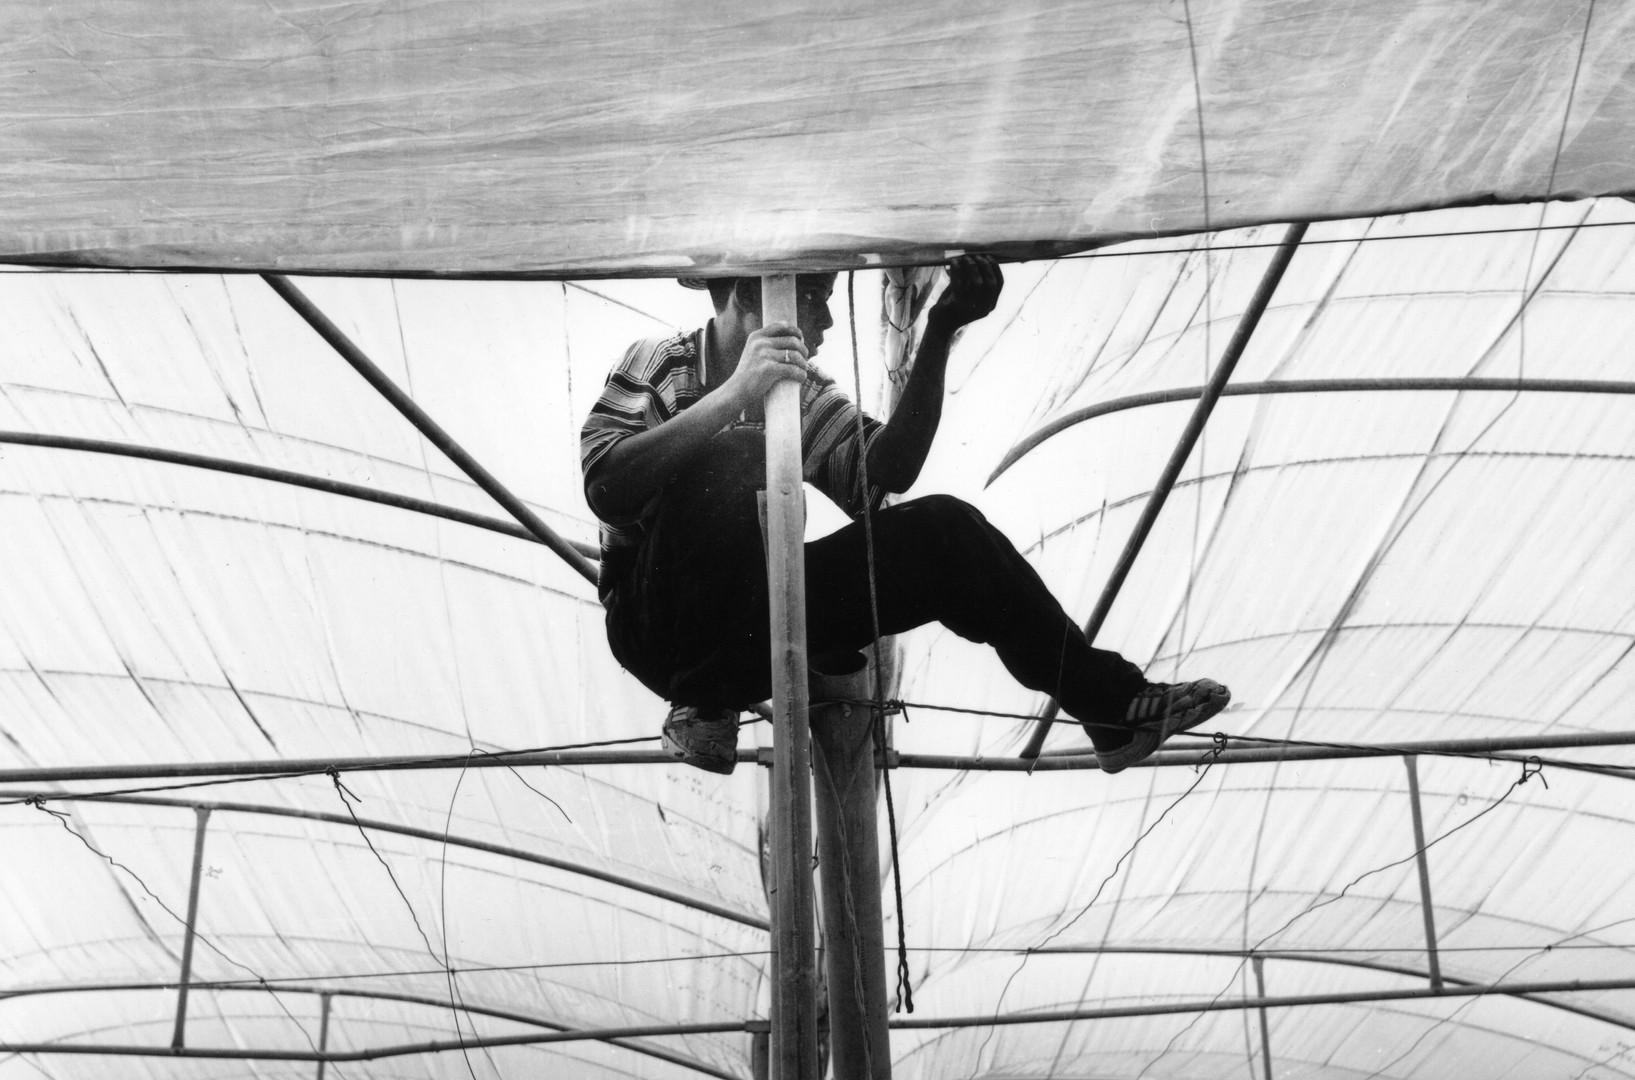 acrobaties rurales #3